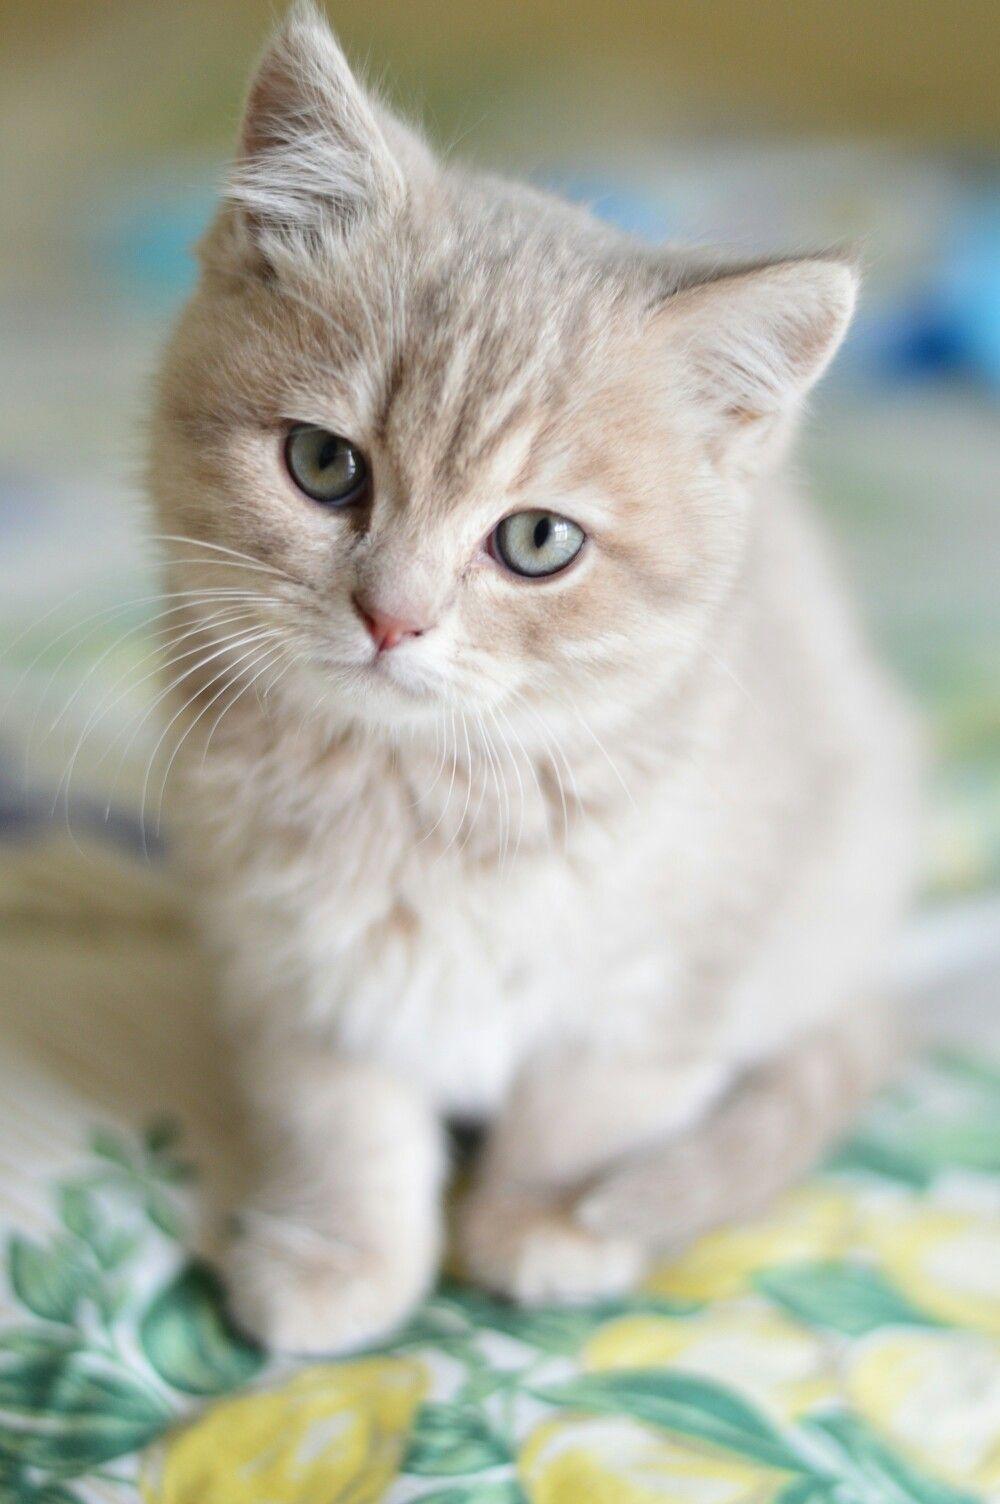 Fullsize Of Cat Peeing On Bed